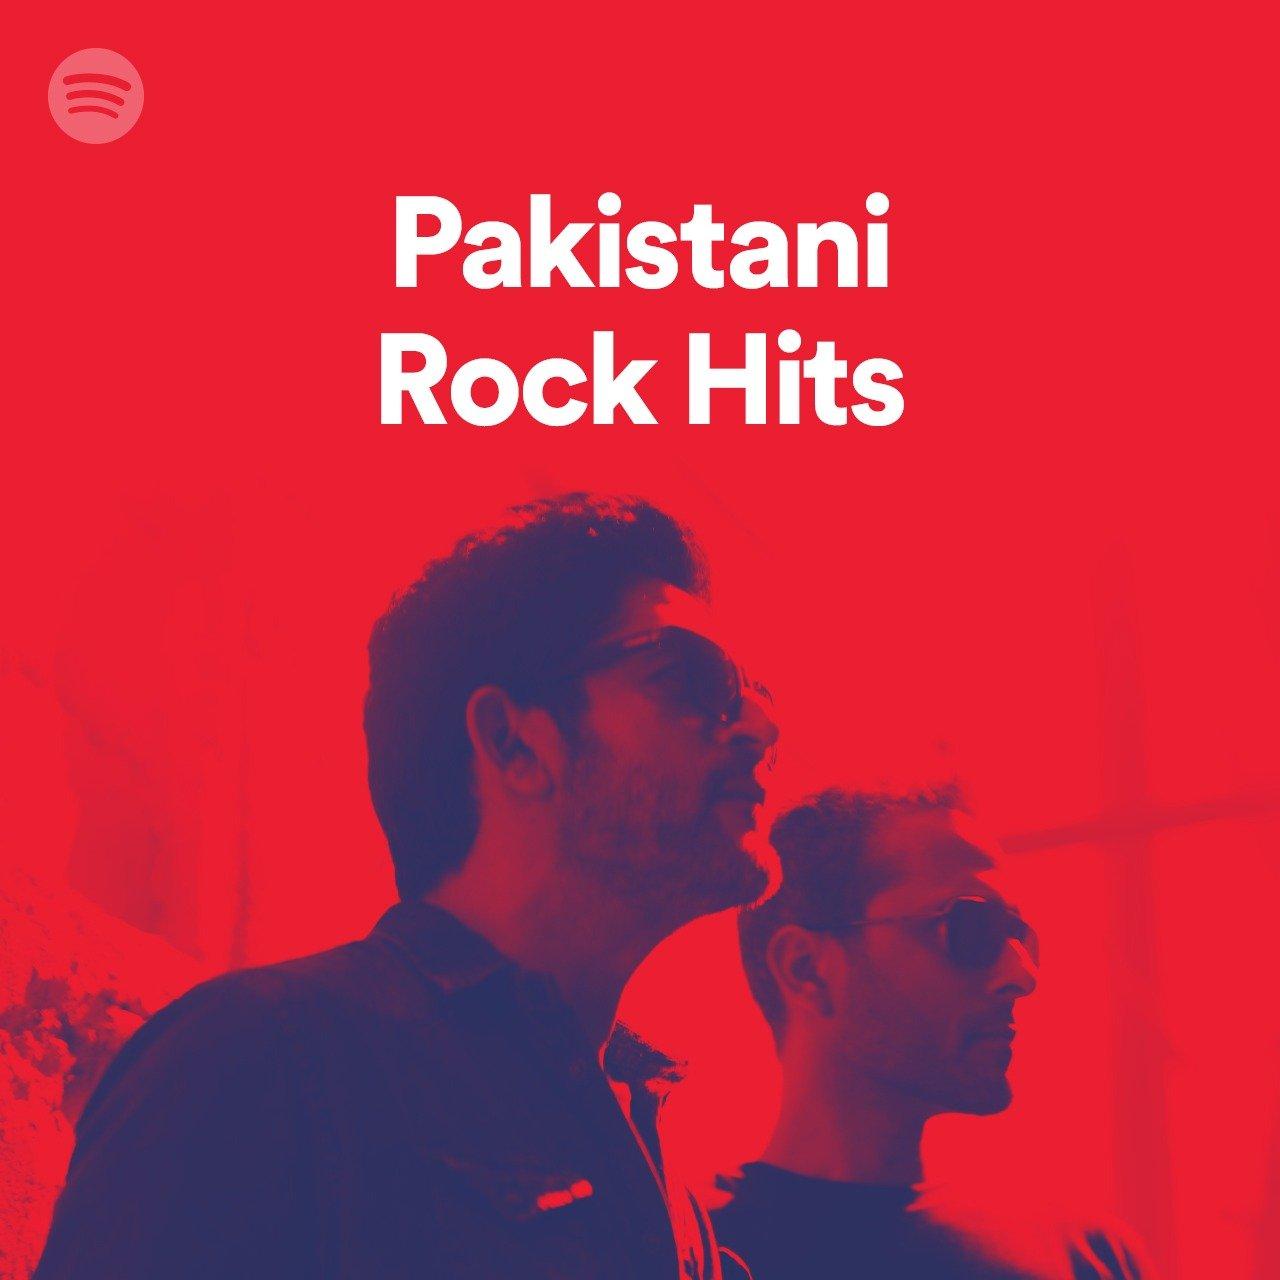 Spotify Pakistan playlists